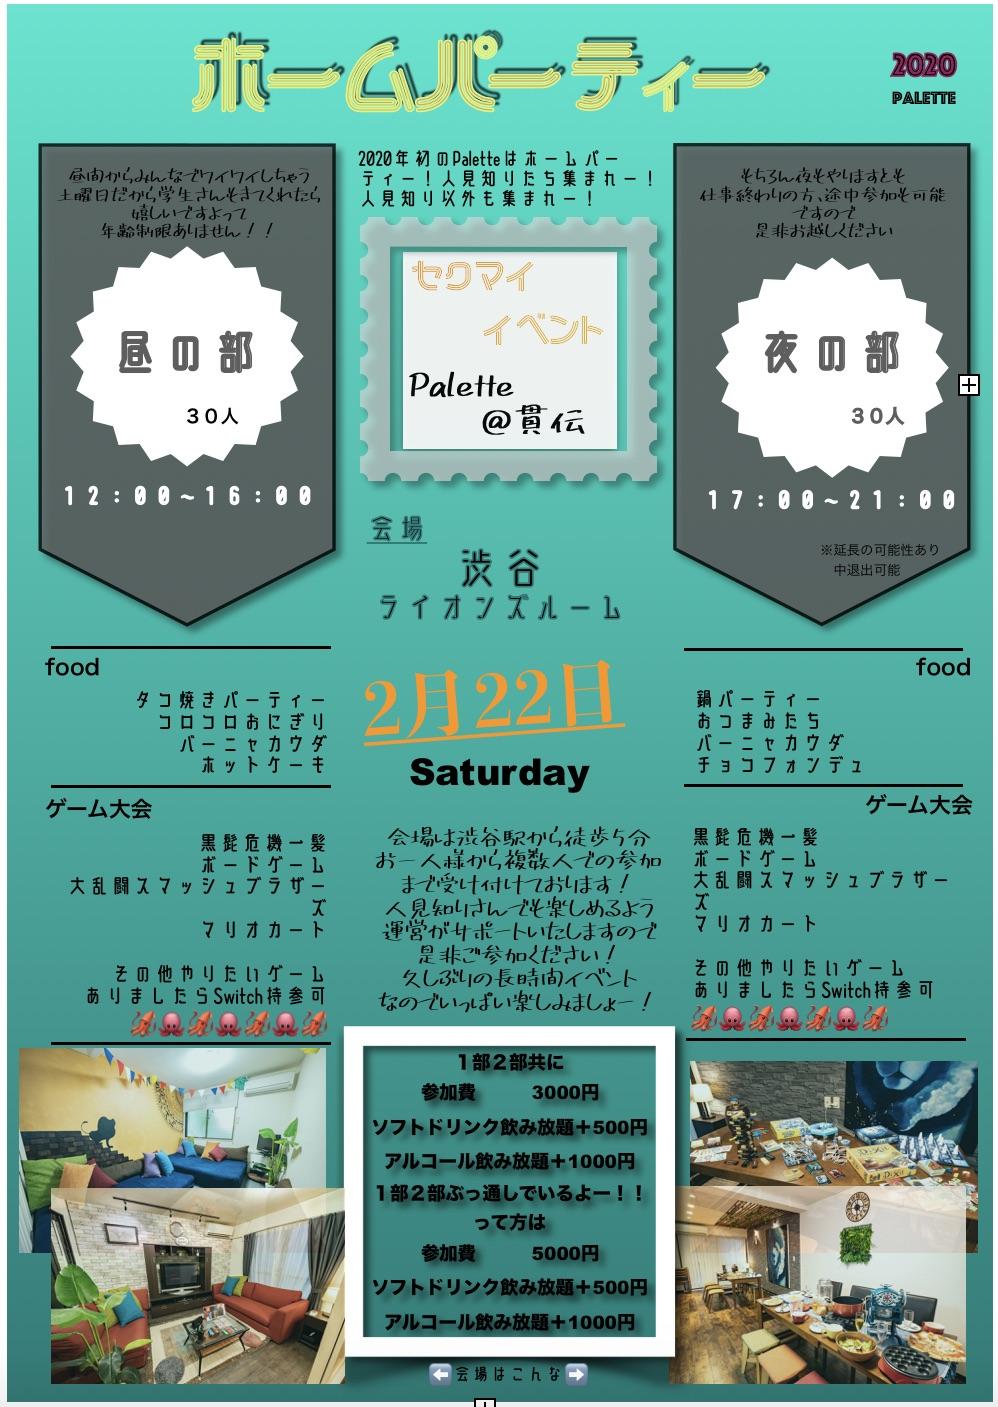 Paletteホームパーティーin渋谷